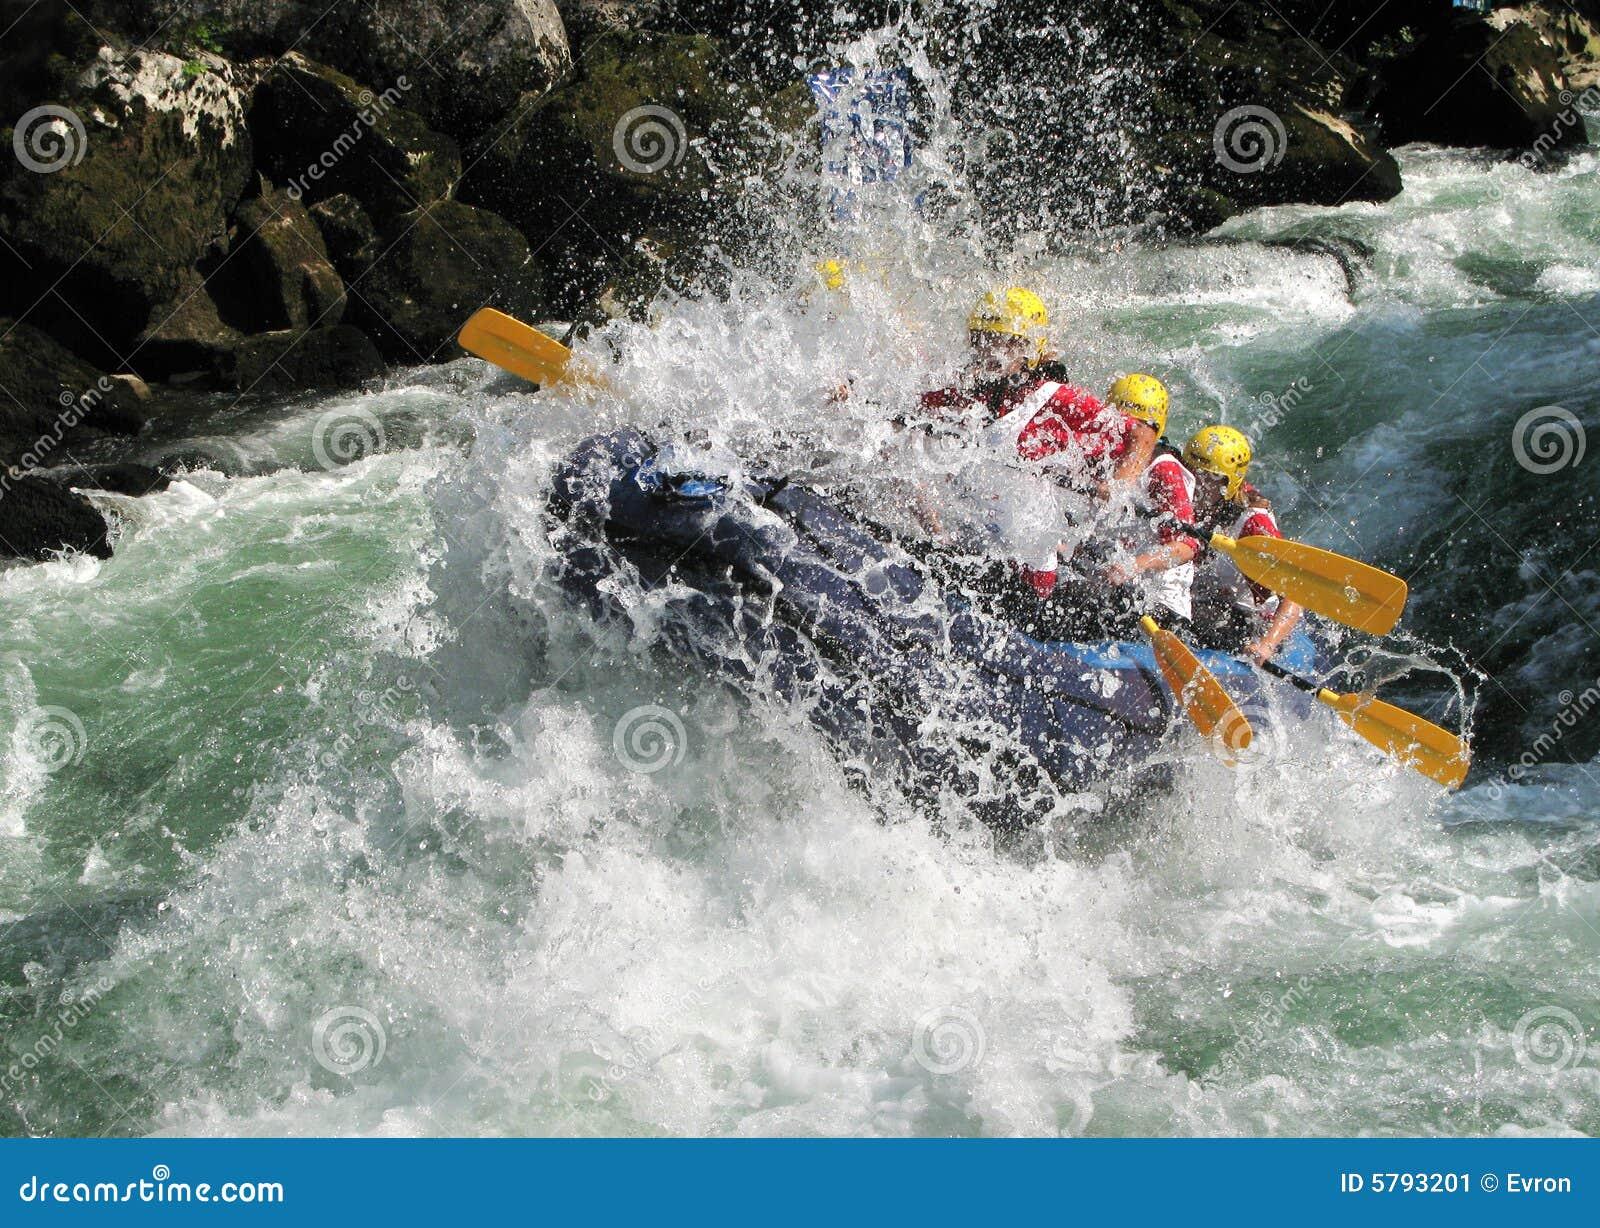 European rafting championship R6